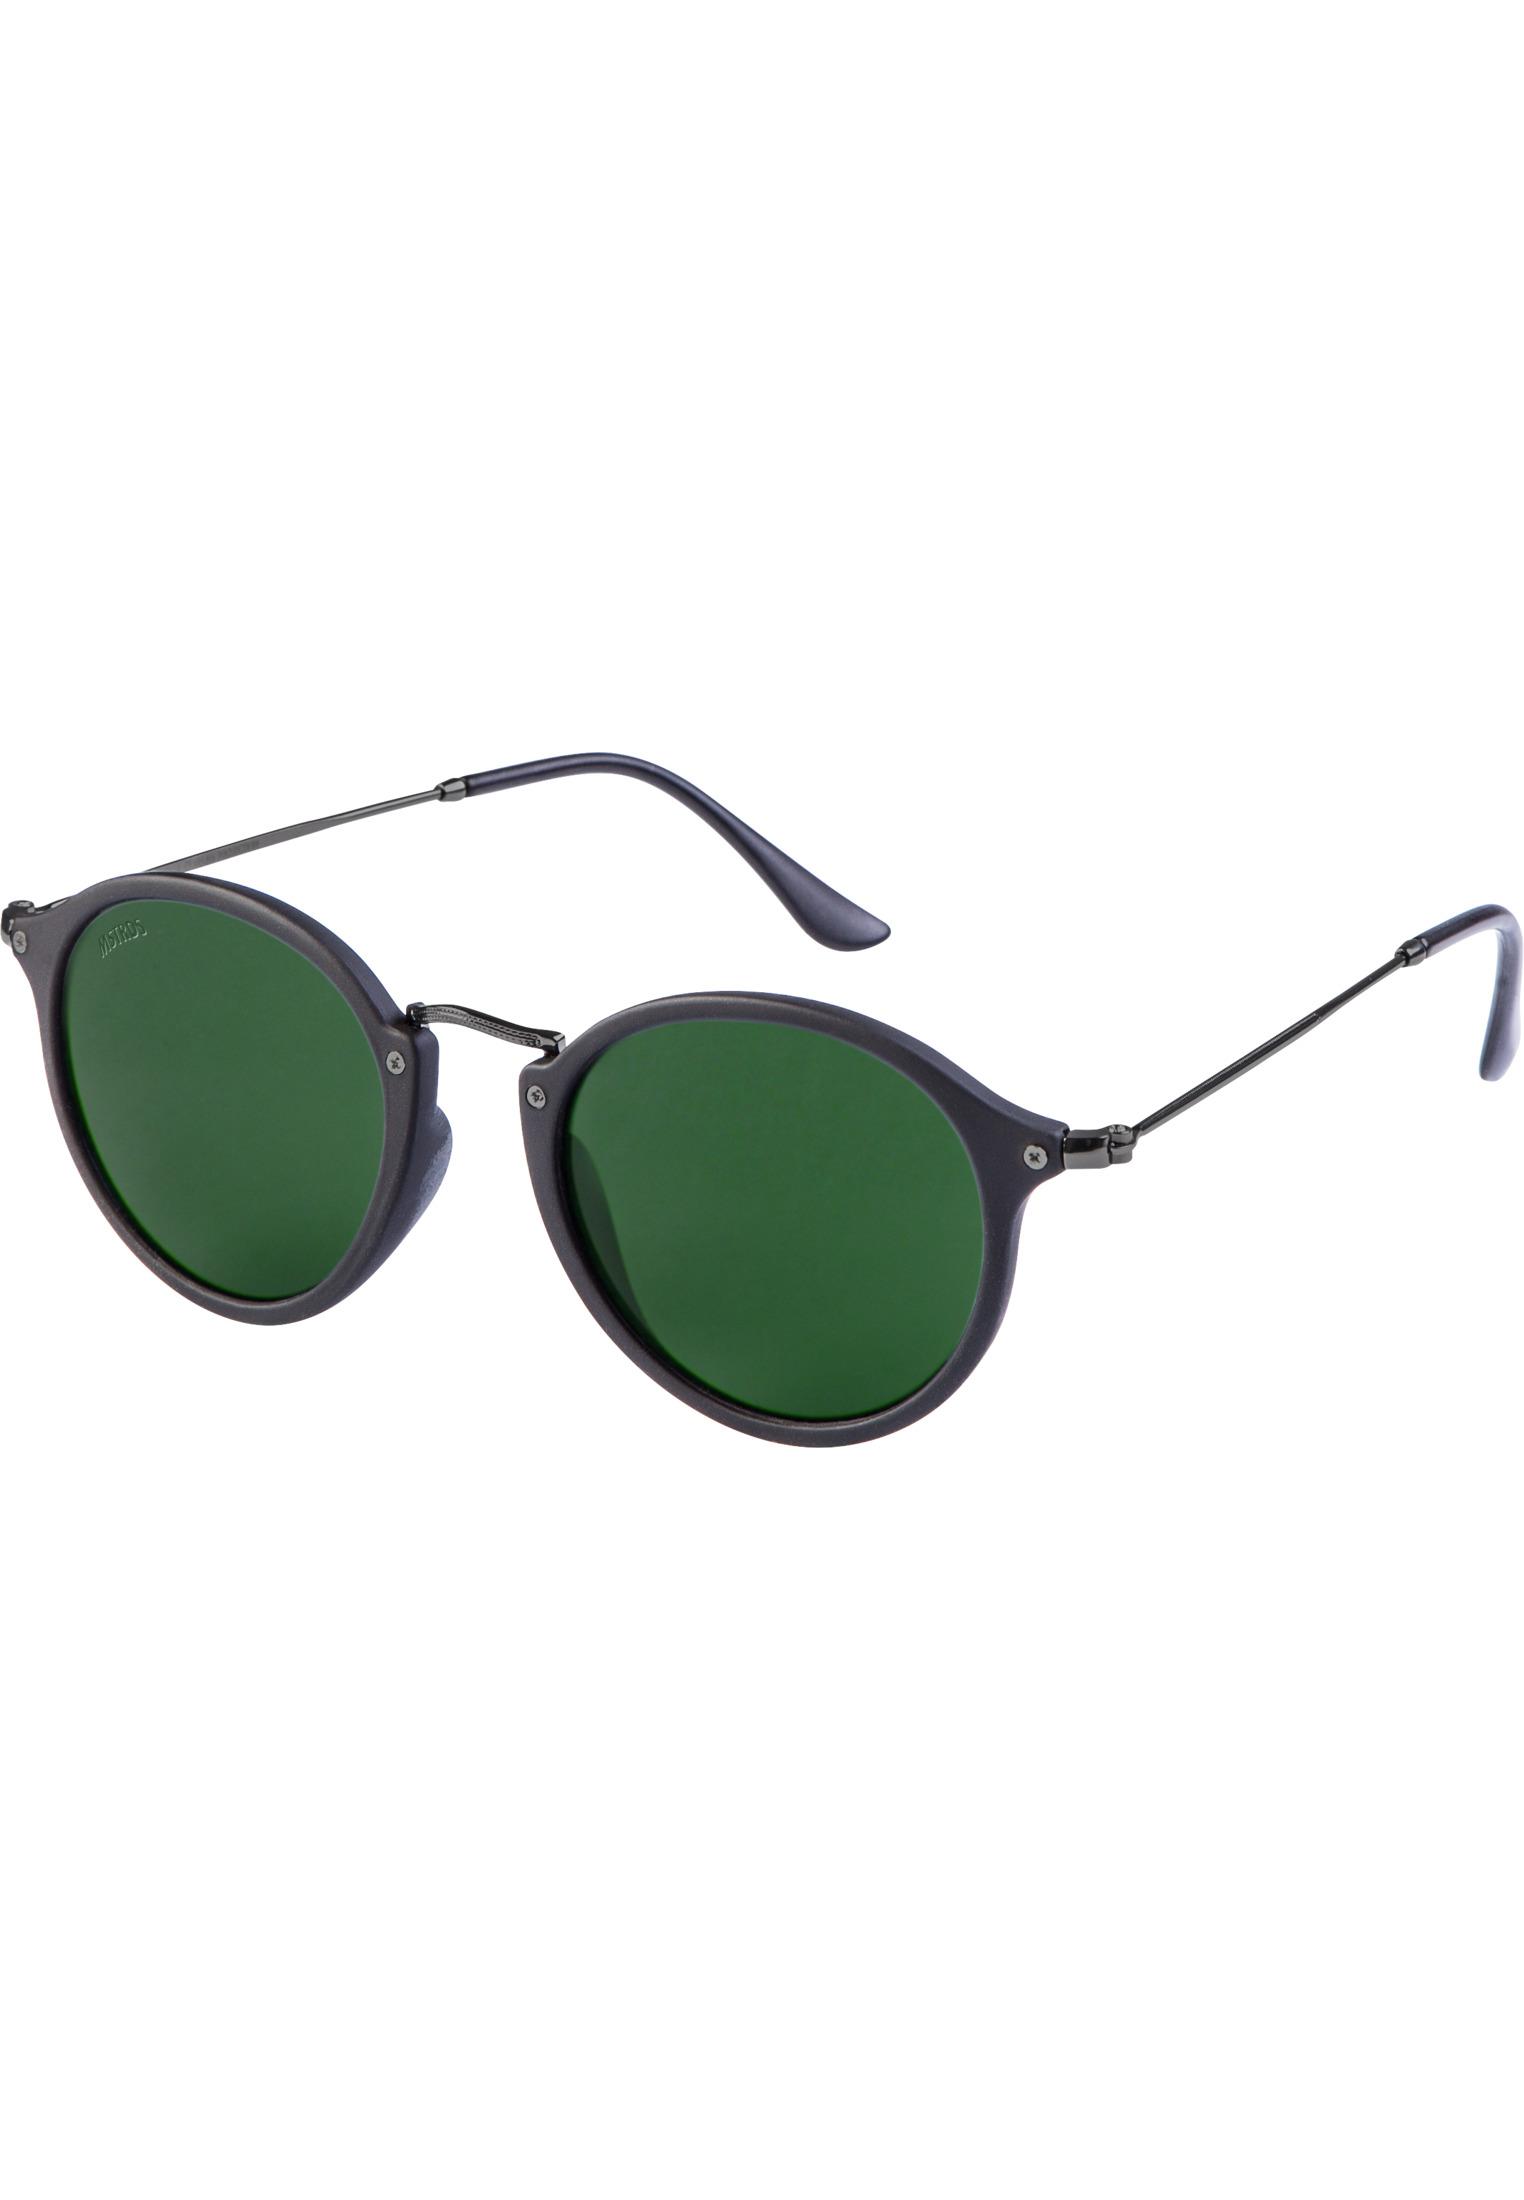 Urban Classics Sunglasses Spy blk/grn j70J8cDe4